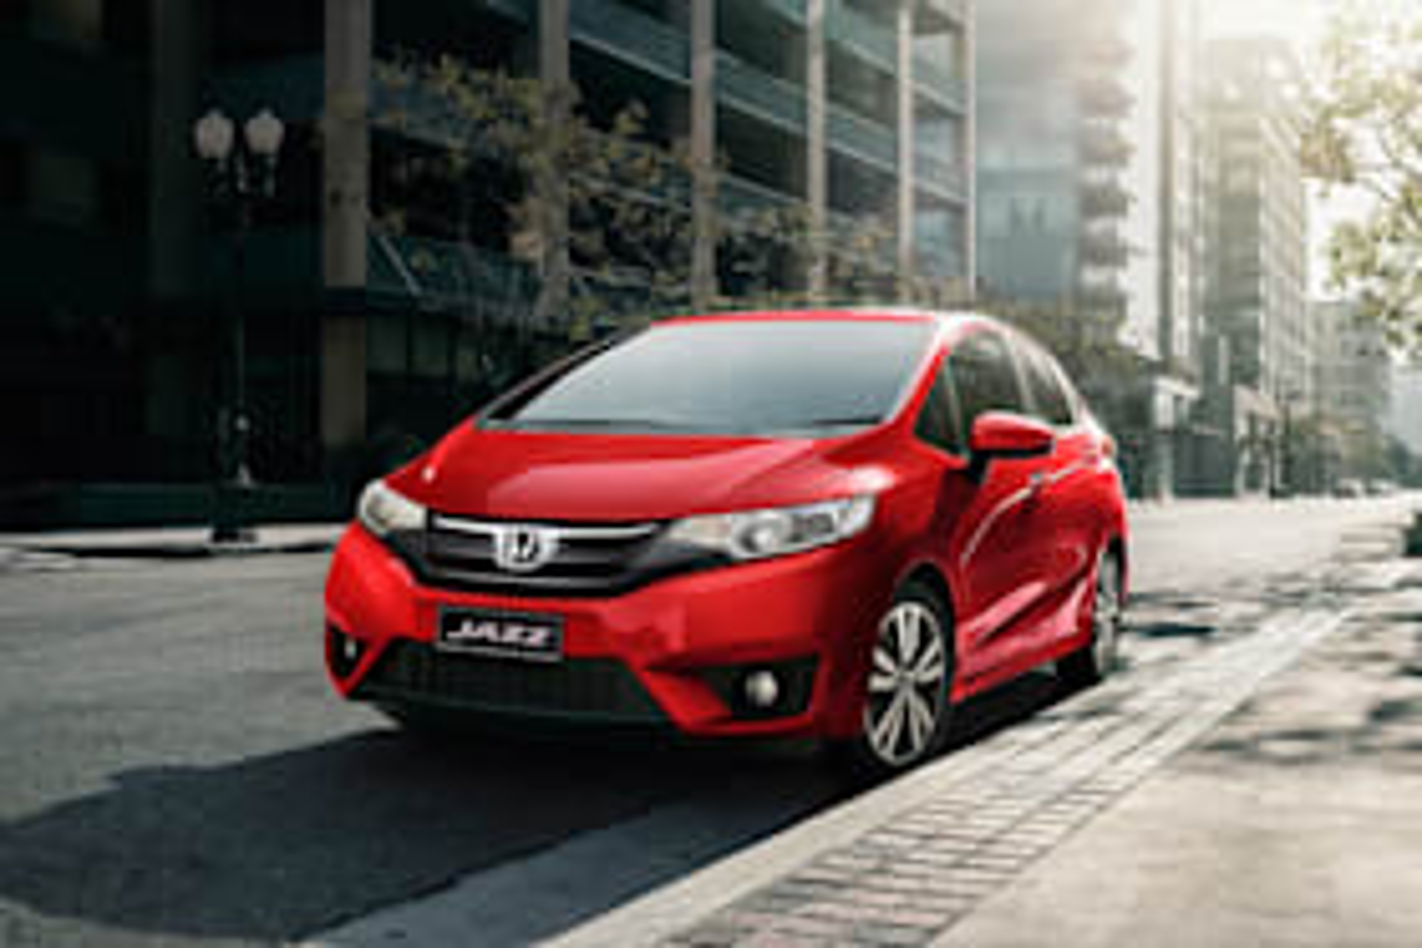 Mitsubishi Mirage VS Suzuki Celerio VS Honda Jazz VS Nissan Micra – Which Car Should I Buy?